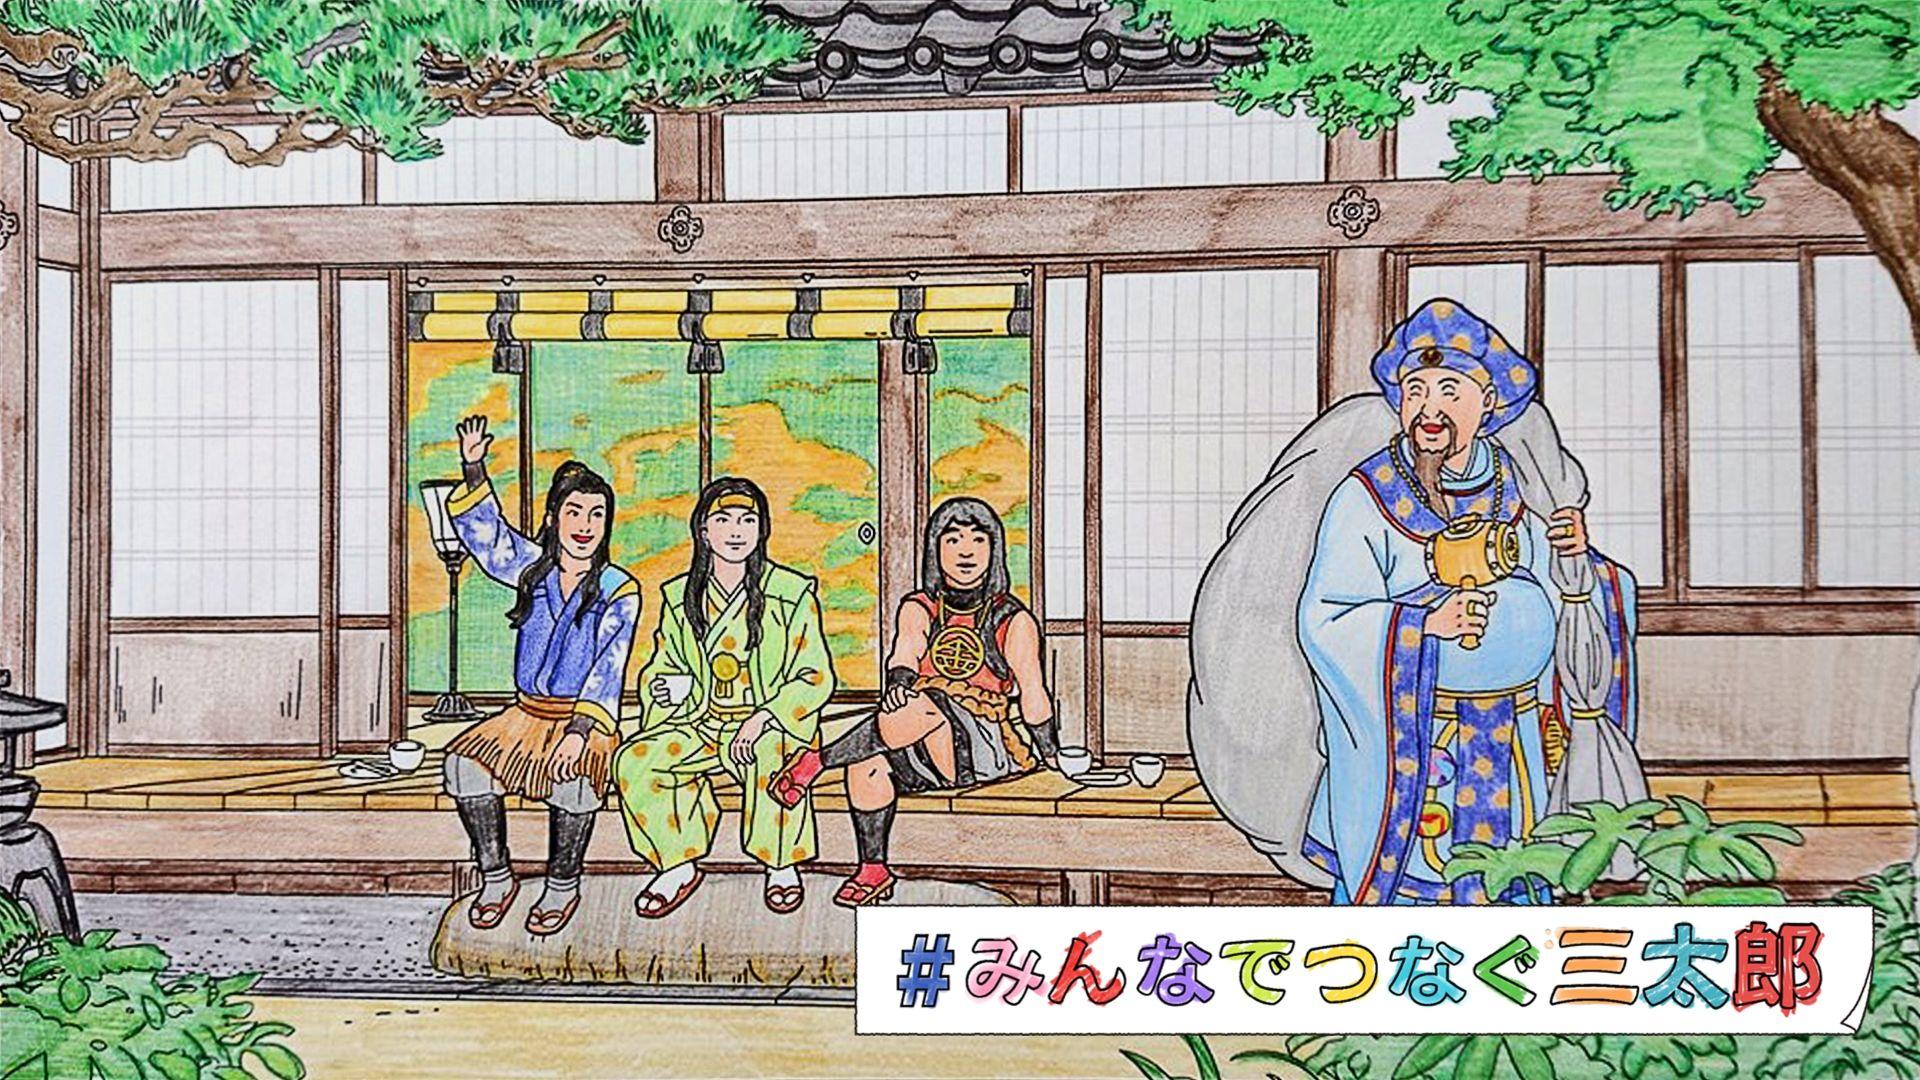 au三太郎アニメCMの『ぬり絵バージョン』完成! 応募作品も一挙紹介